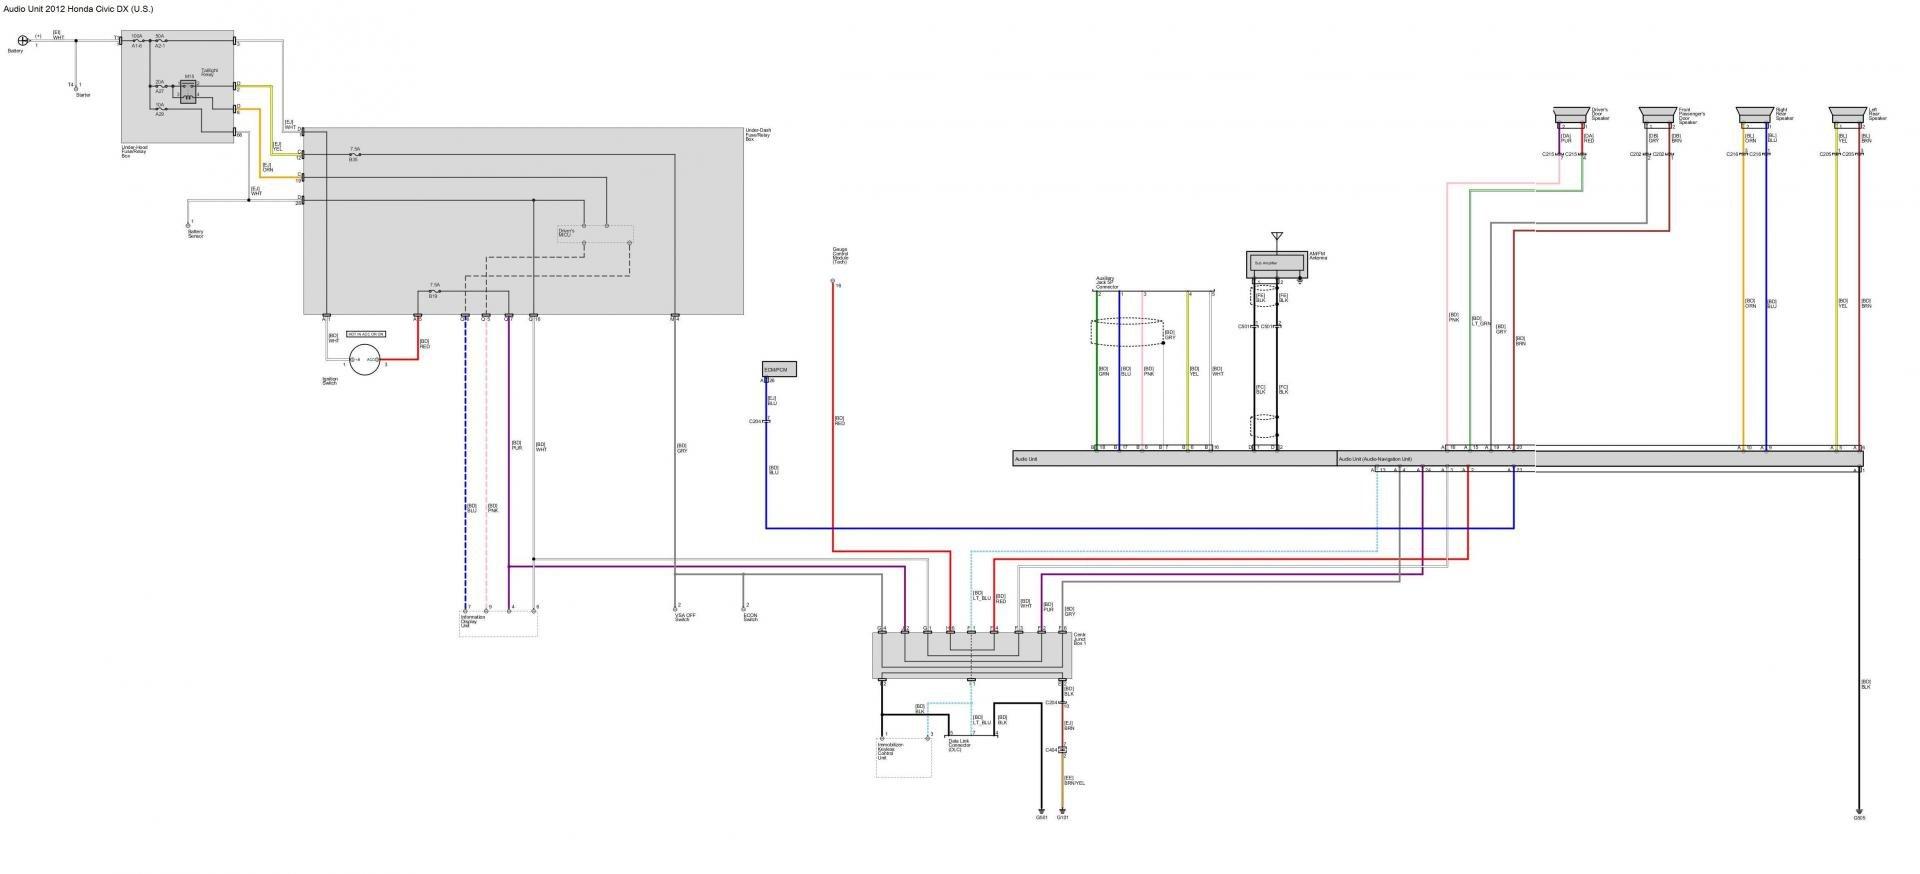 Audio Wiring Diagrams Post Em If You Got Em 9th Gen Civic Forum